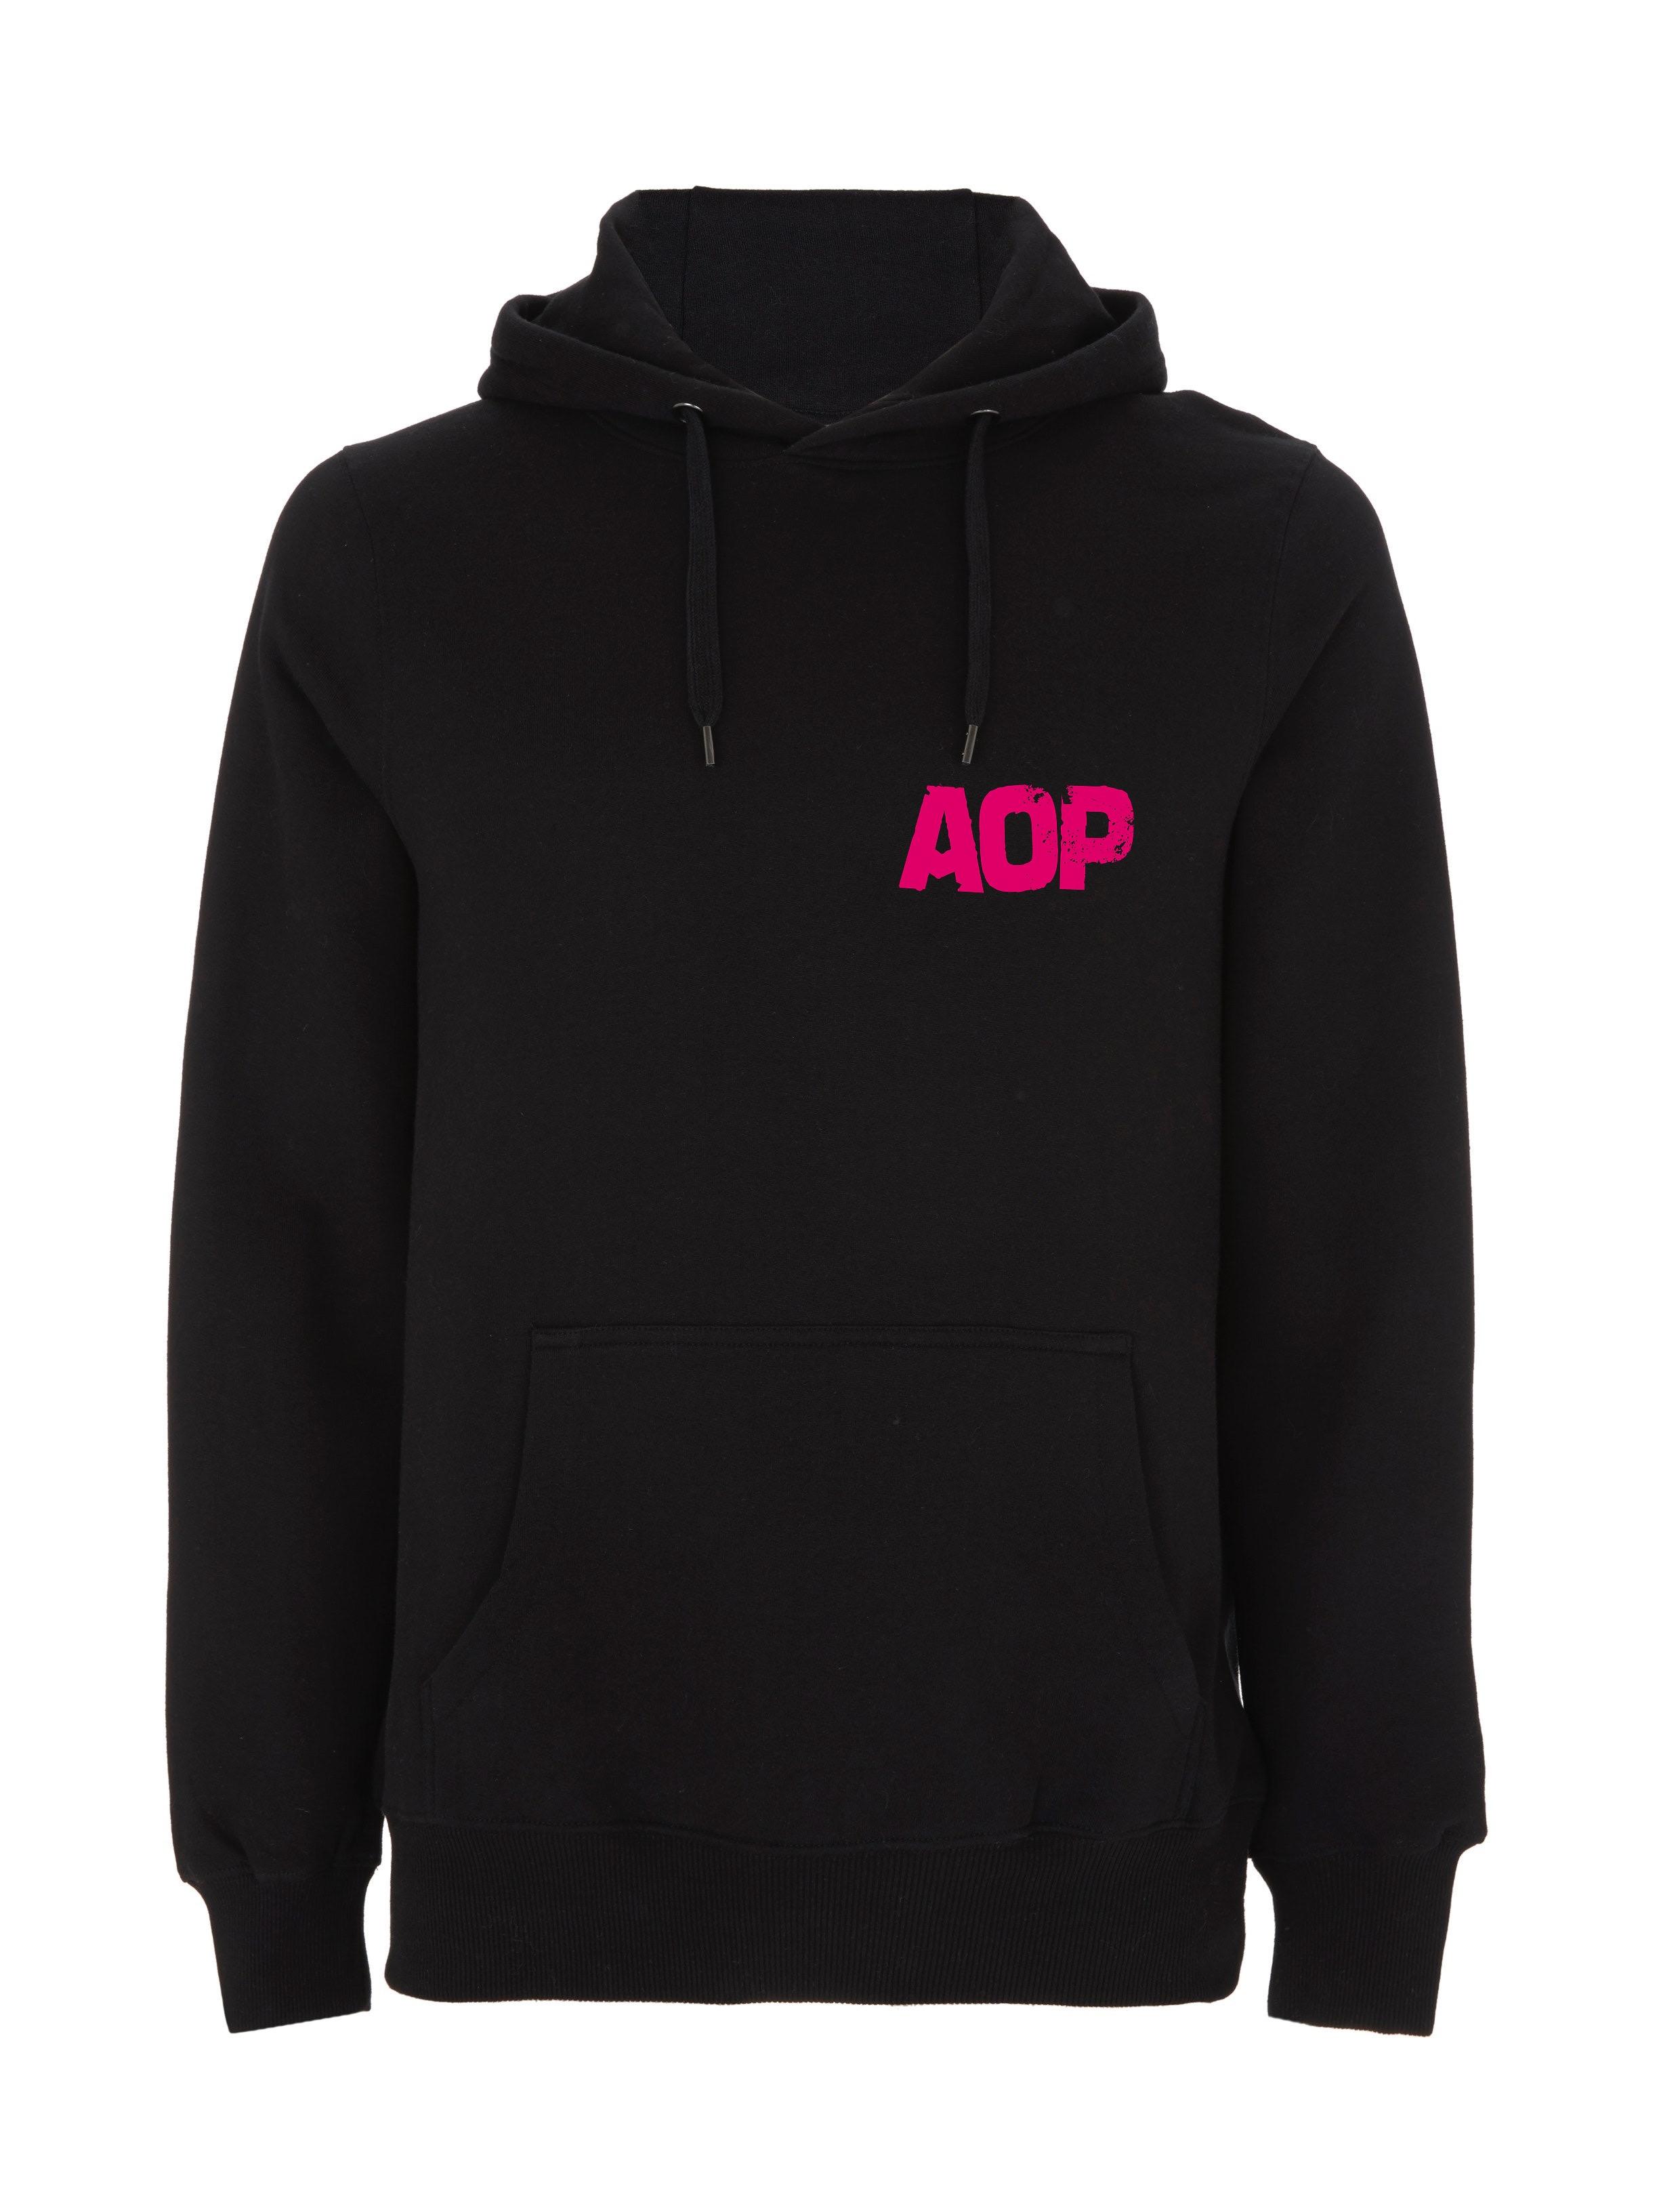 AOP – Von wegen Punkrock – Hoodie (schwarz)